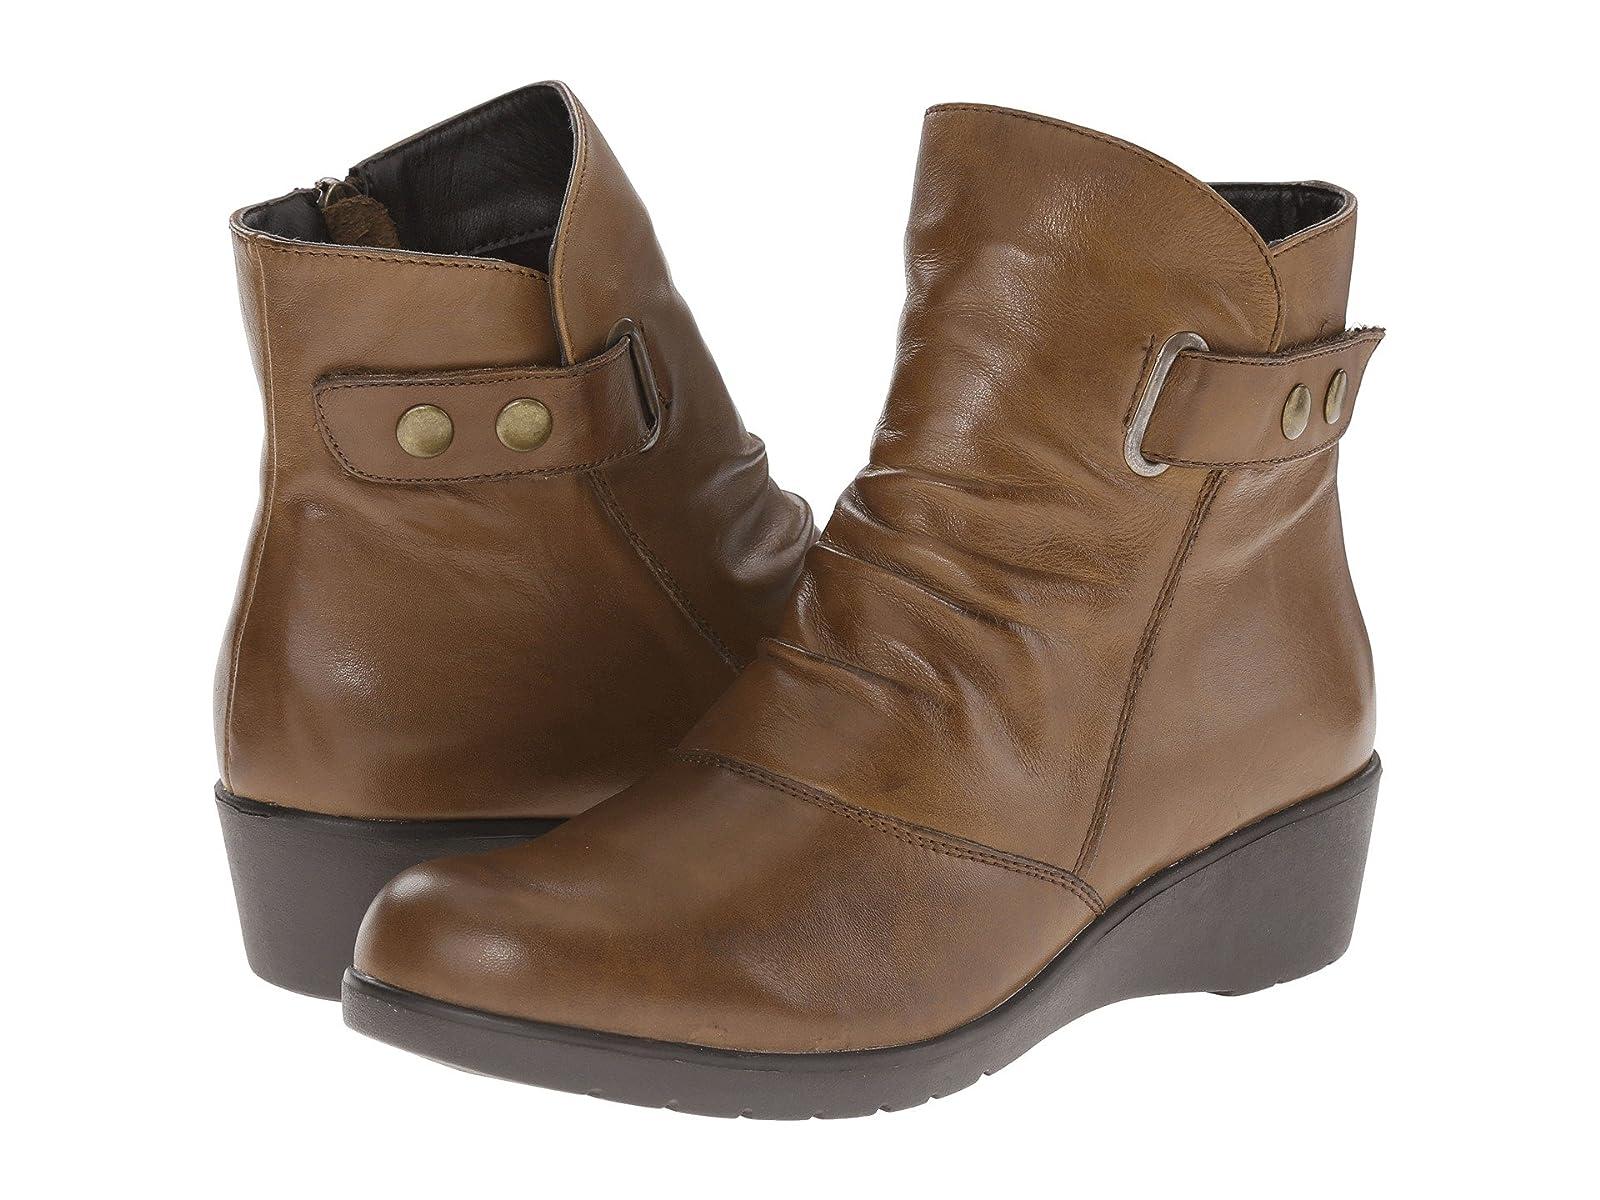 Spring Step SmoreEconomical and quality shoes